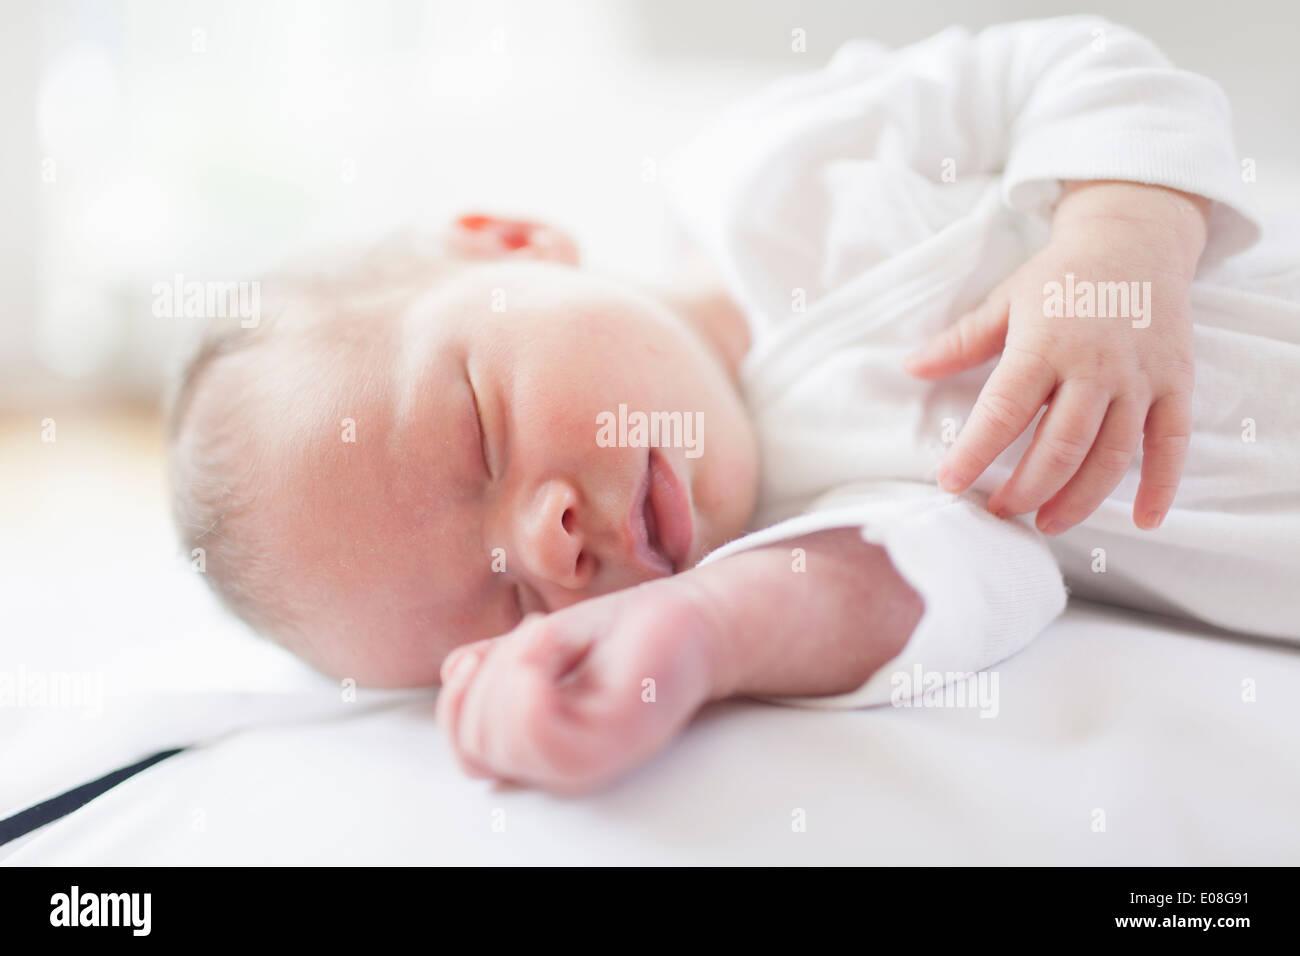 Bebé recién nacido duerme apaciblemente Imagen De Stock